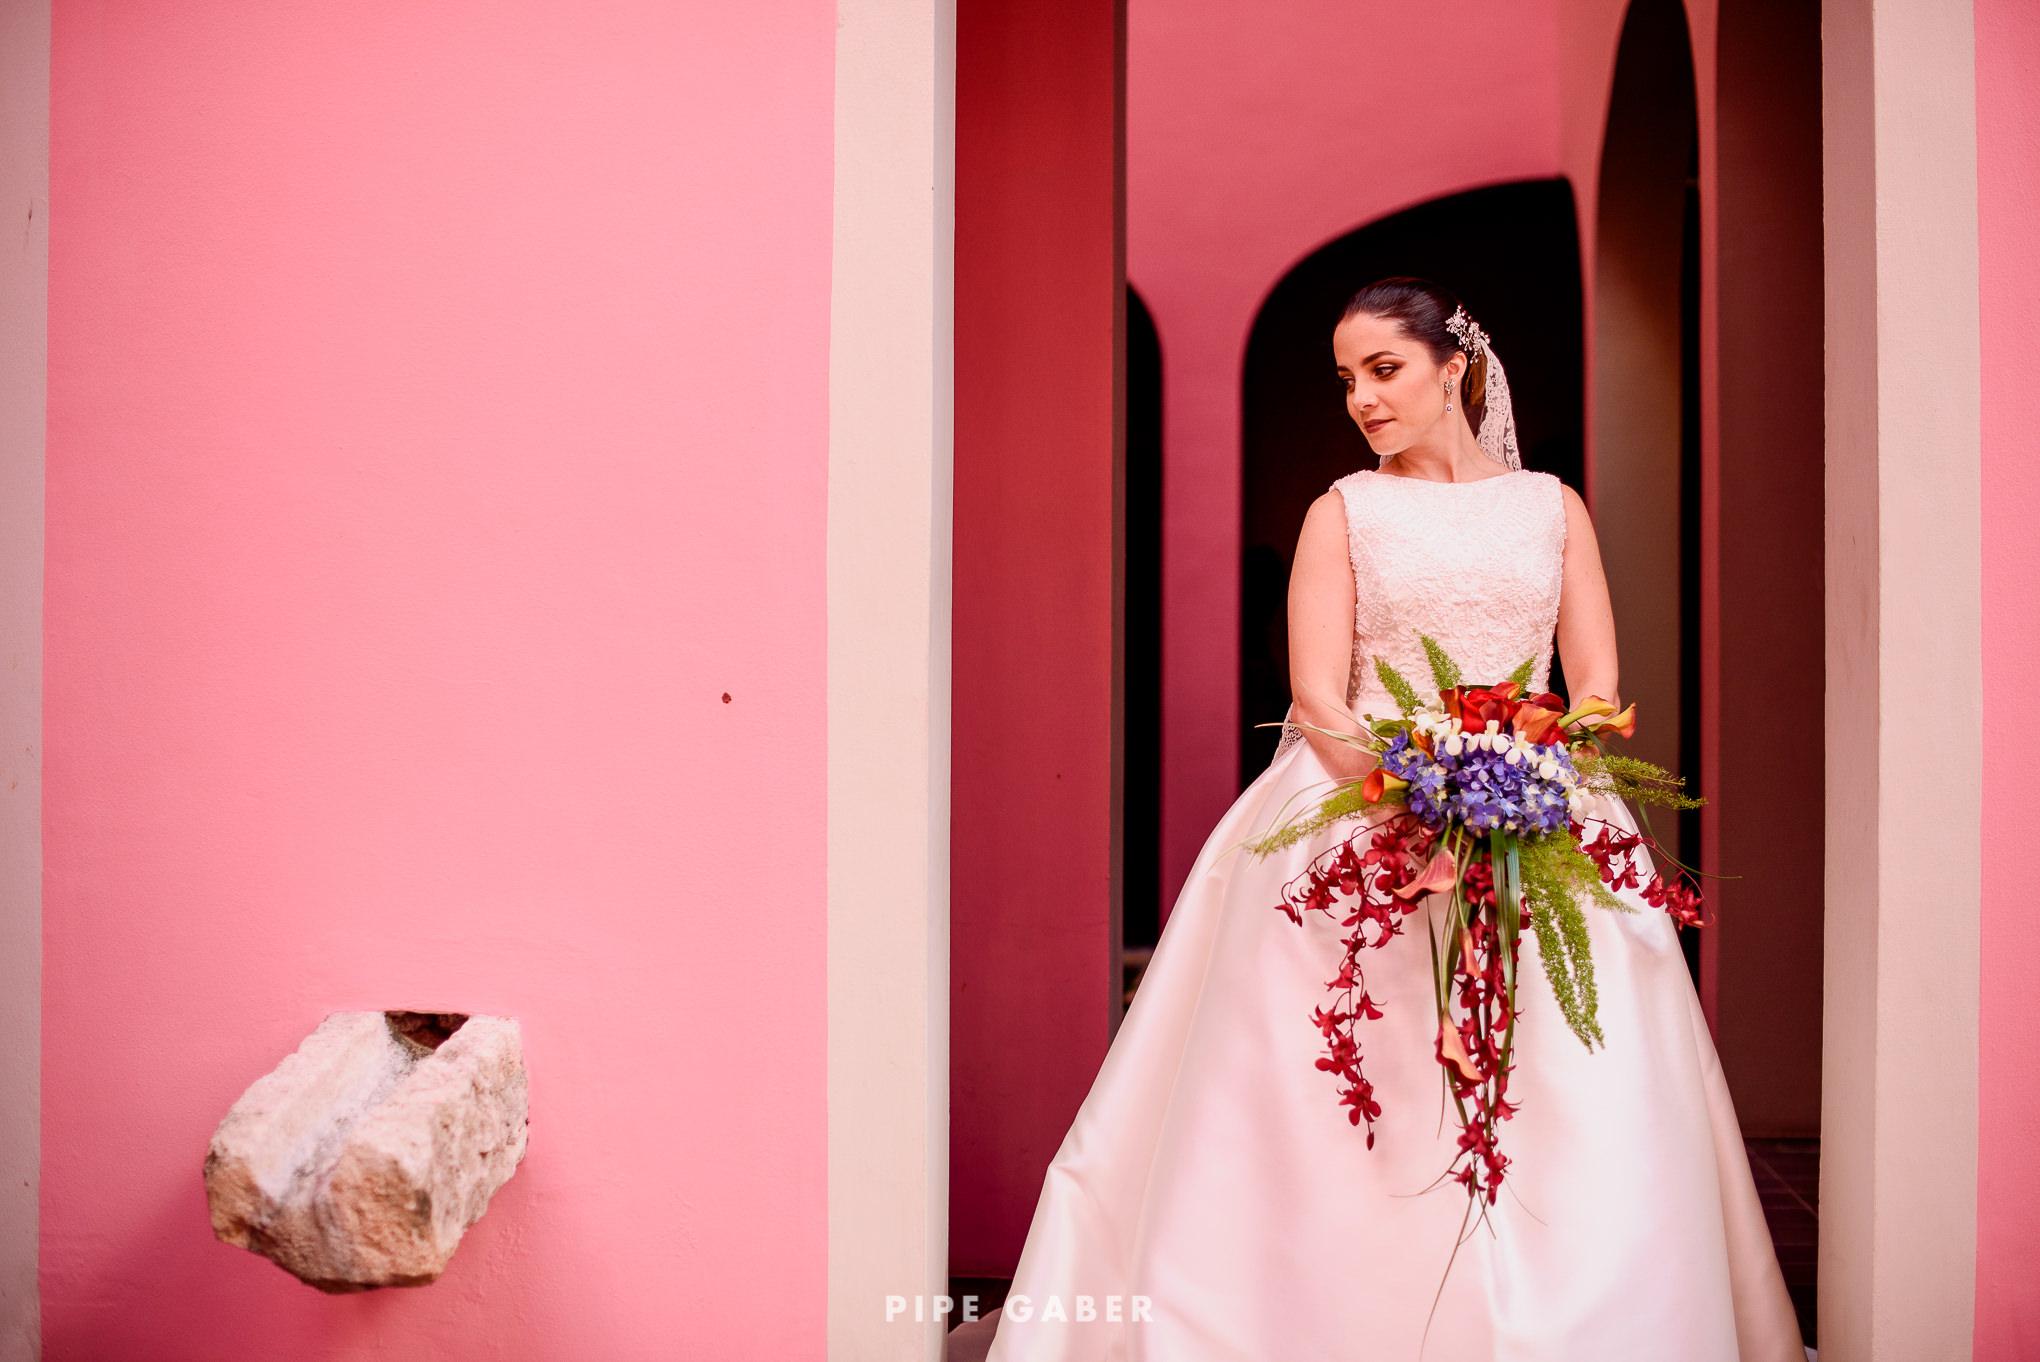 17_02_18_WEDDING_AIDITA_NEZBIT_MIGUEL_DOGRE_29_web.jpg